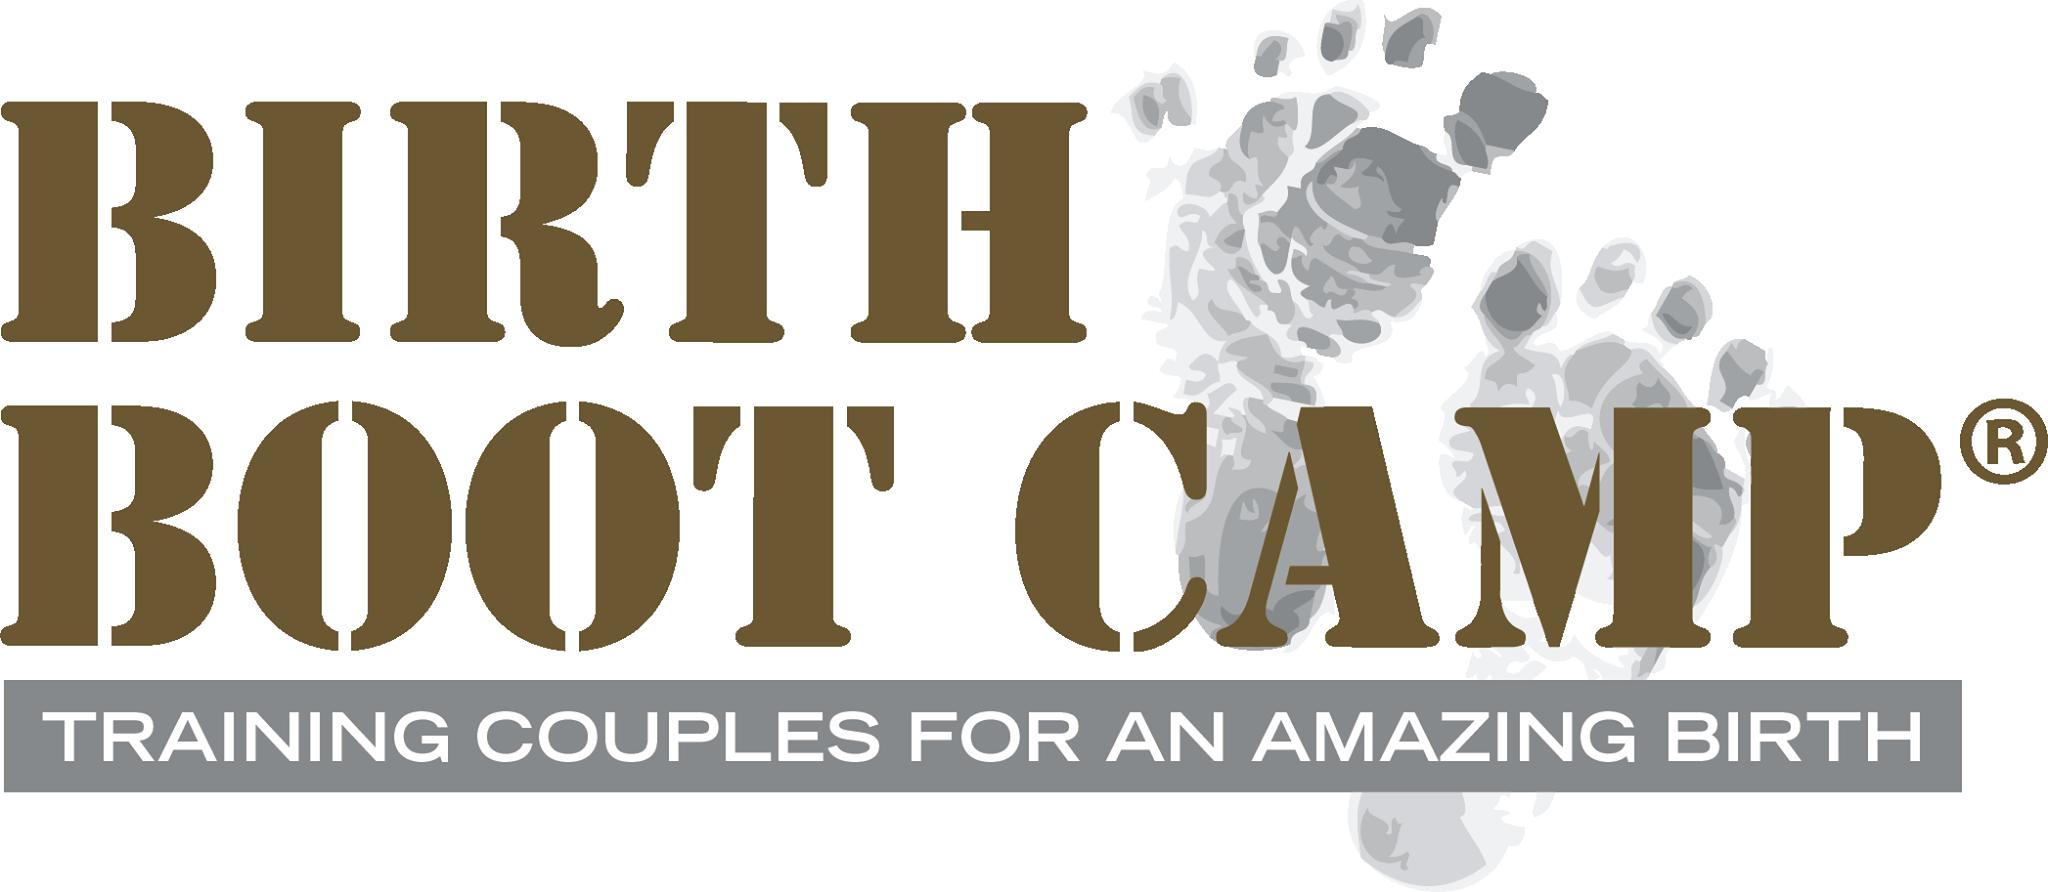 teach Birth Boot Camp childbirth classes